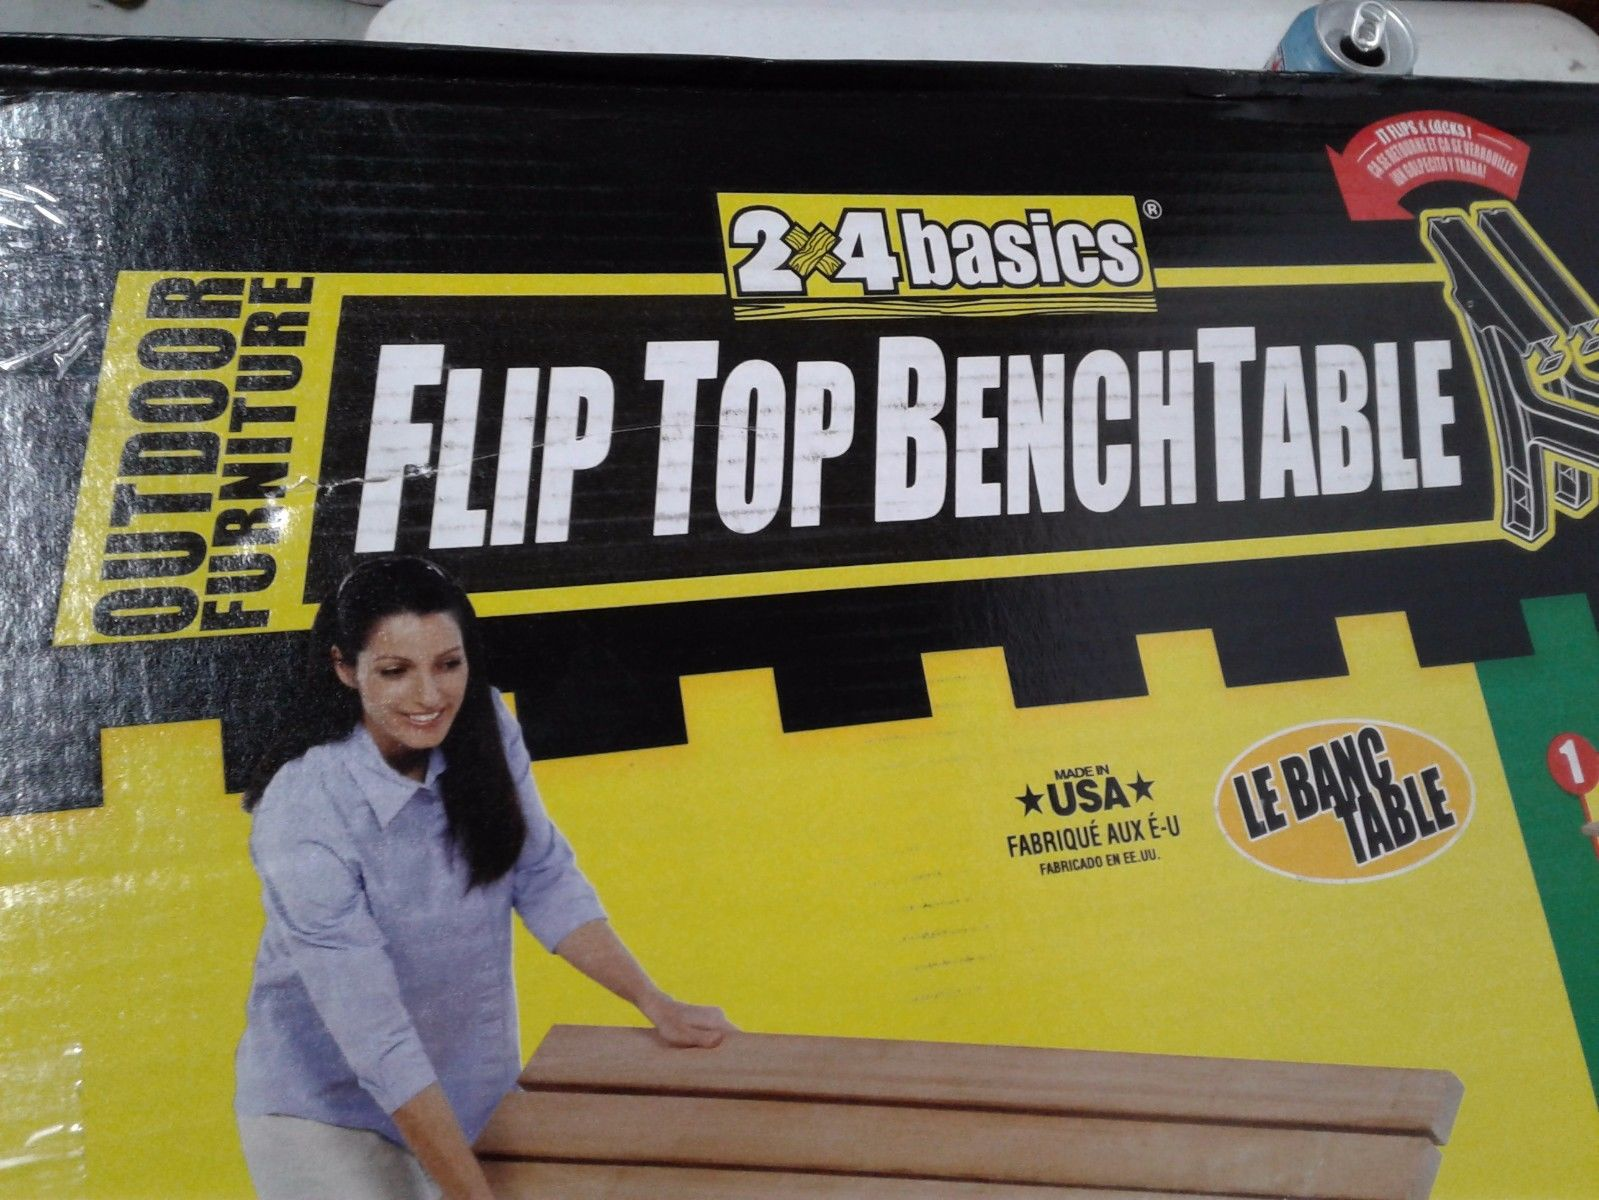 2x4 Basics Flip Top Benchtable Sand Model 90110